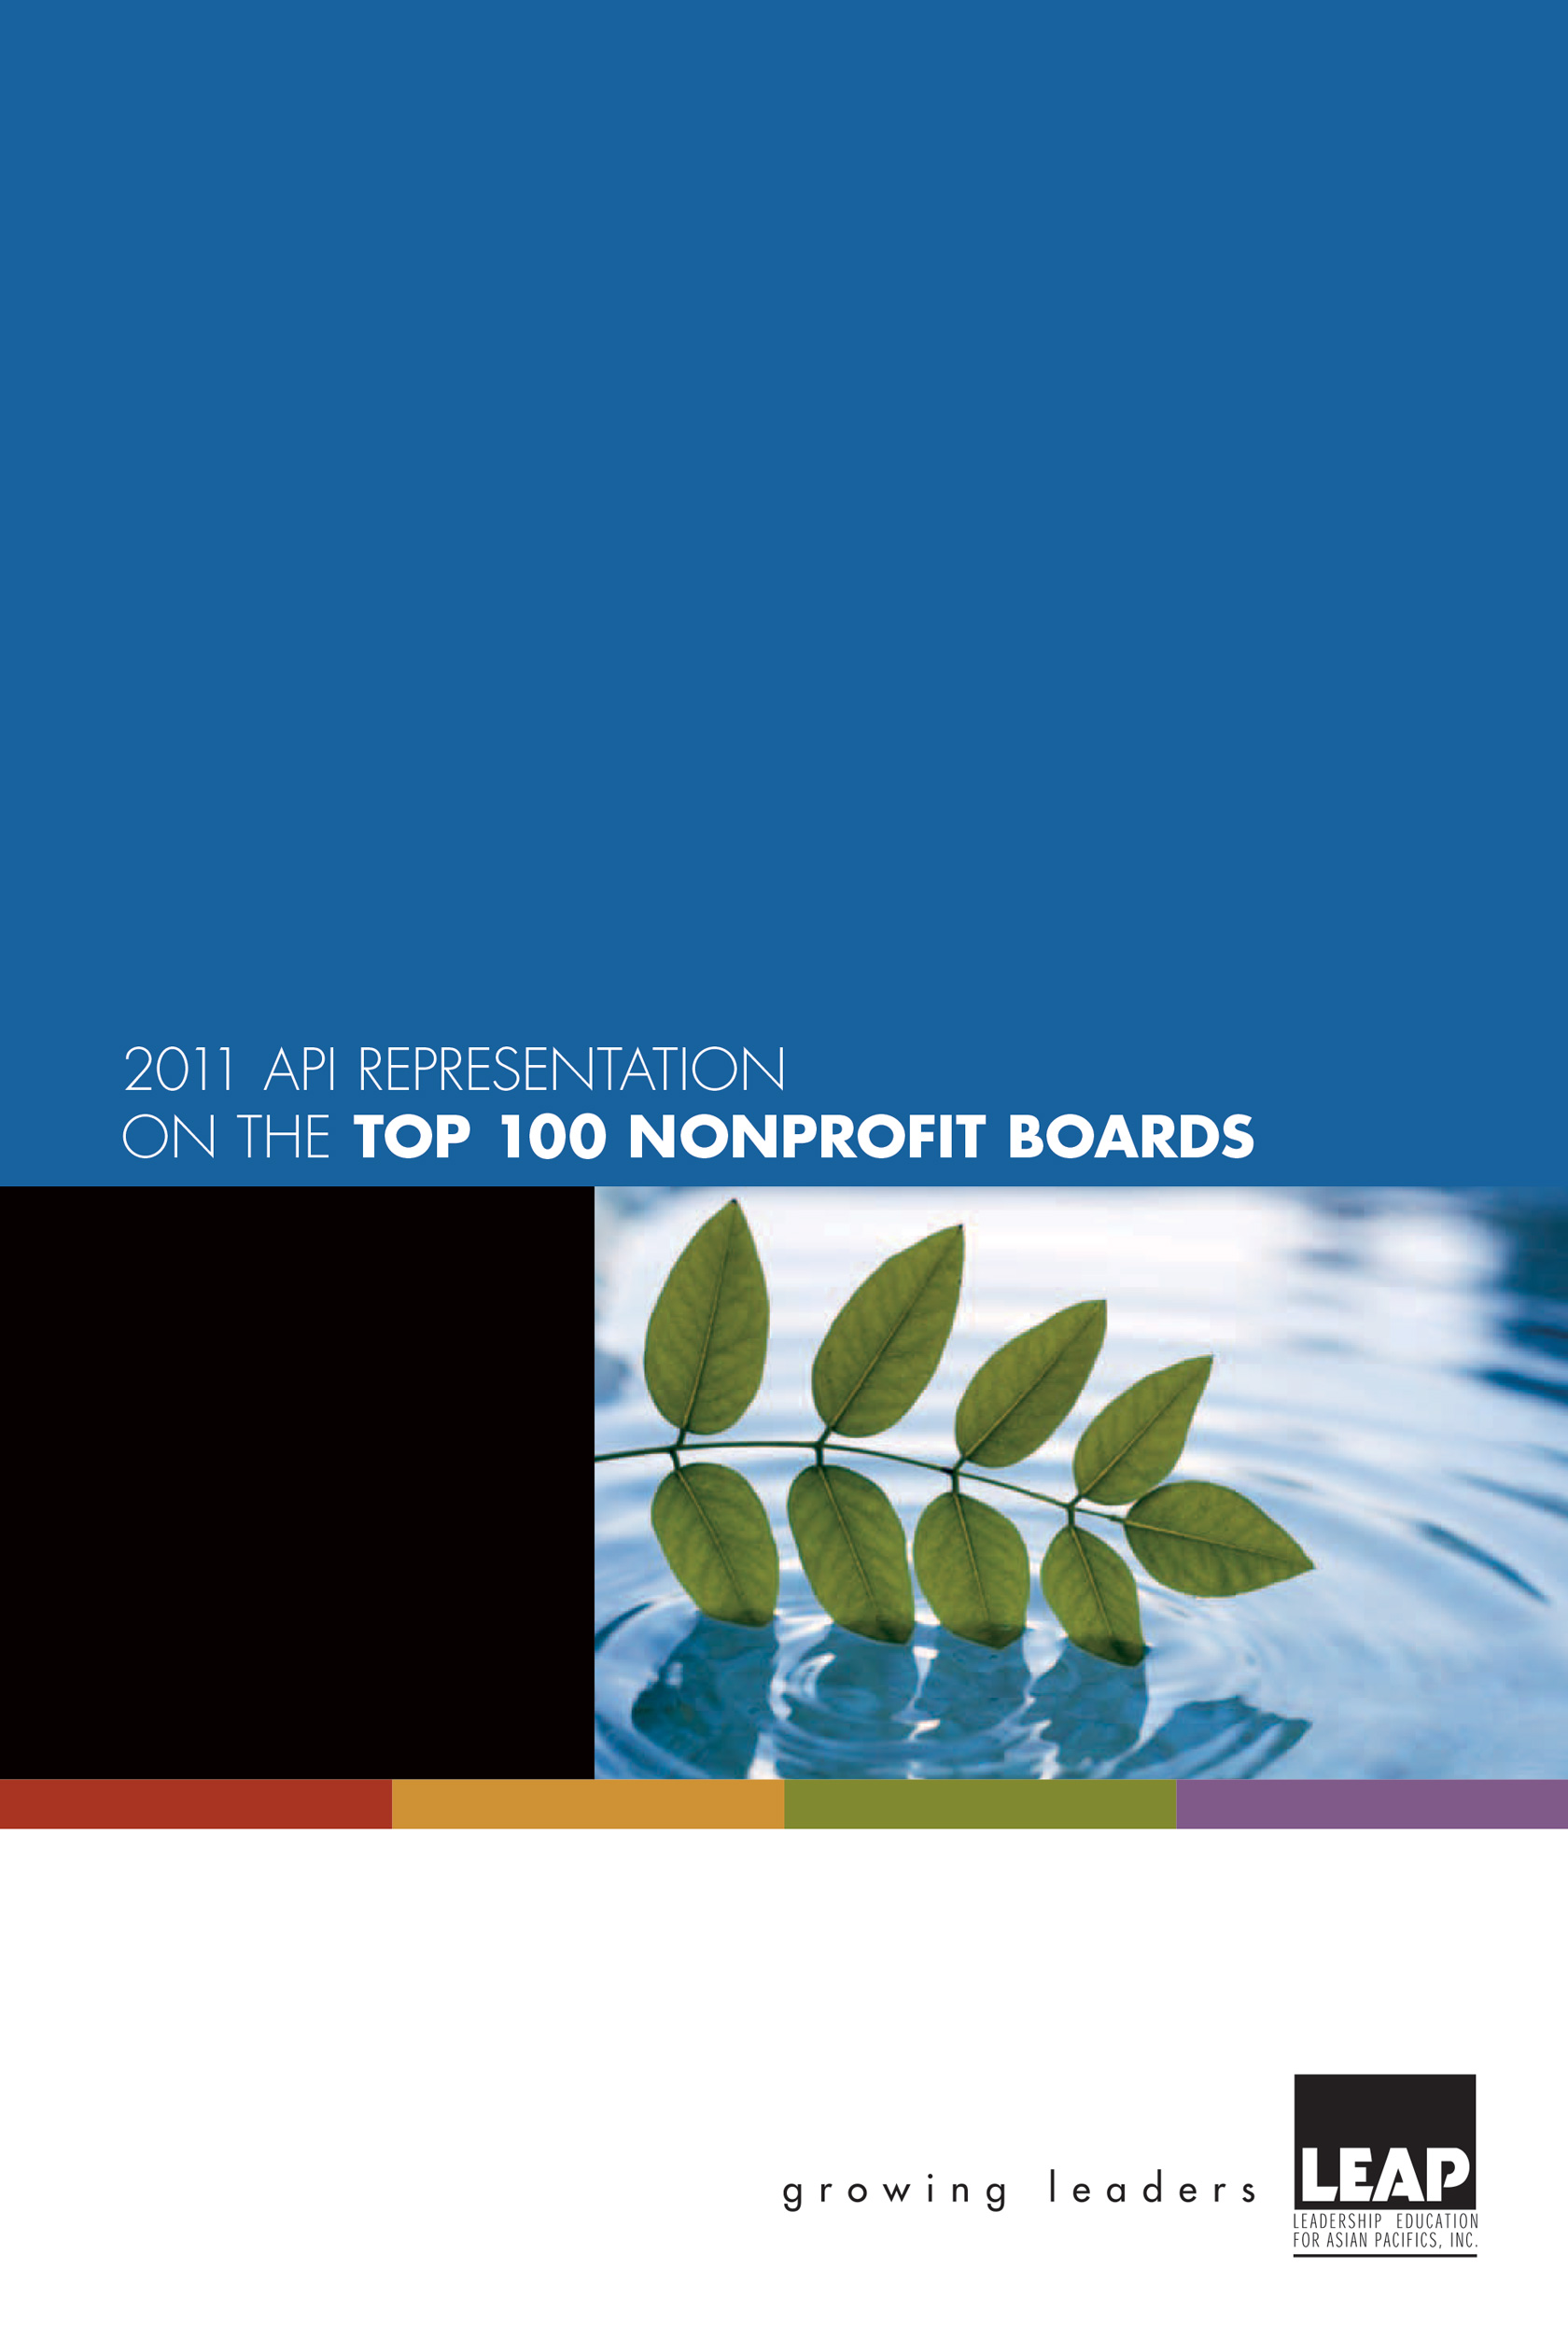 2011-LEAP-Top-100-Nonprofits-Report-FINAL-Cover.jpg